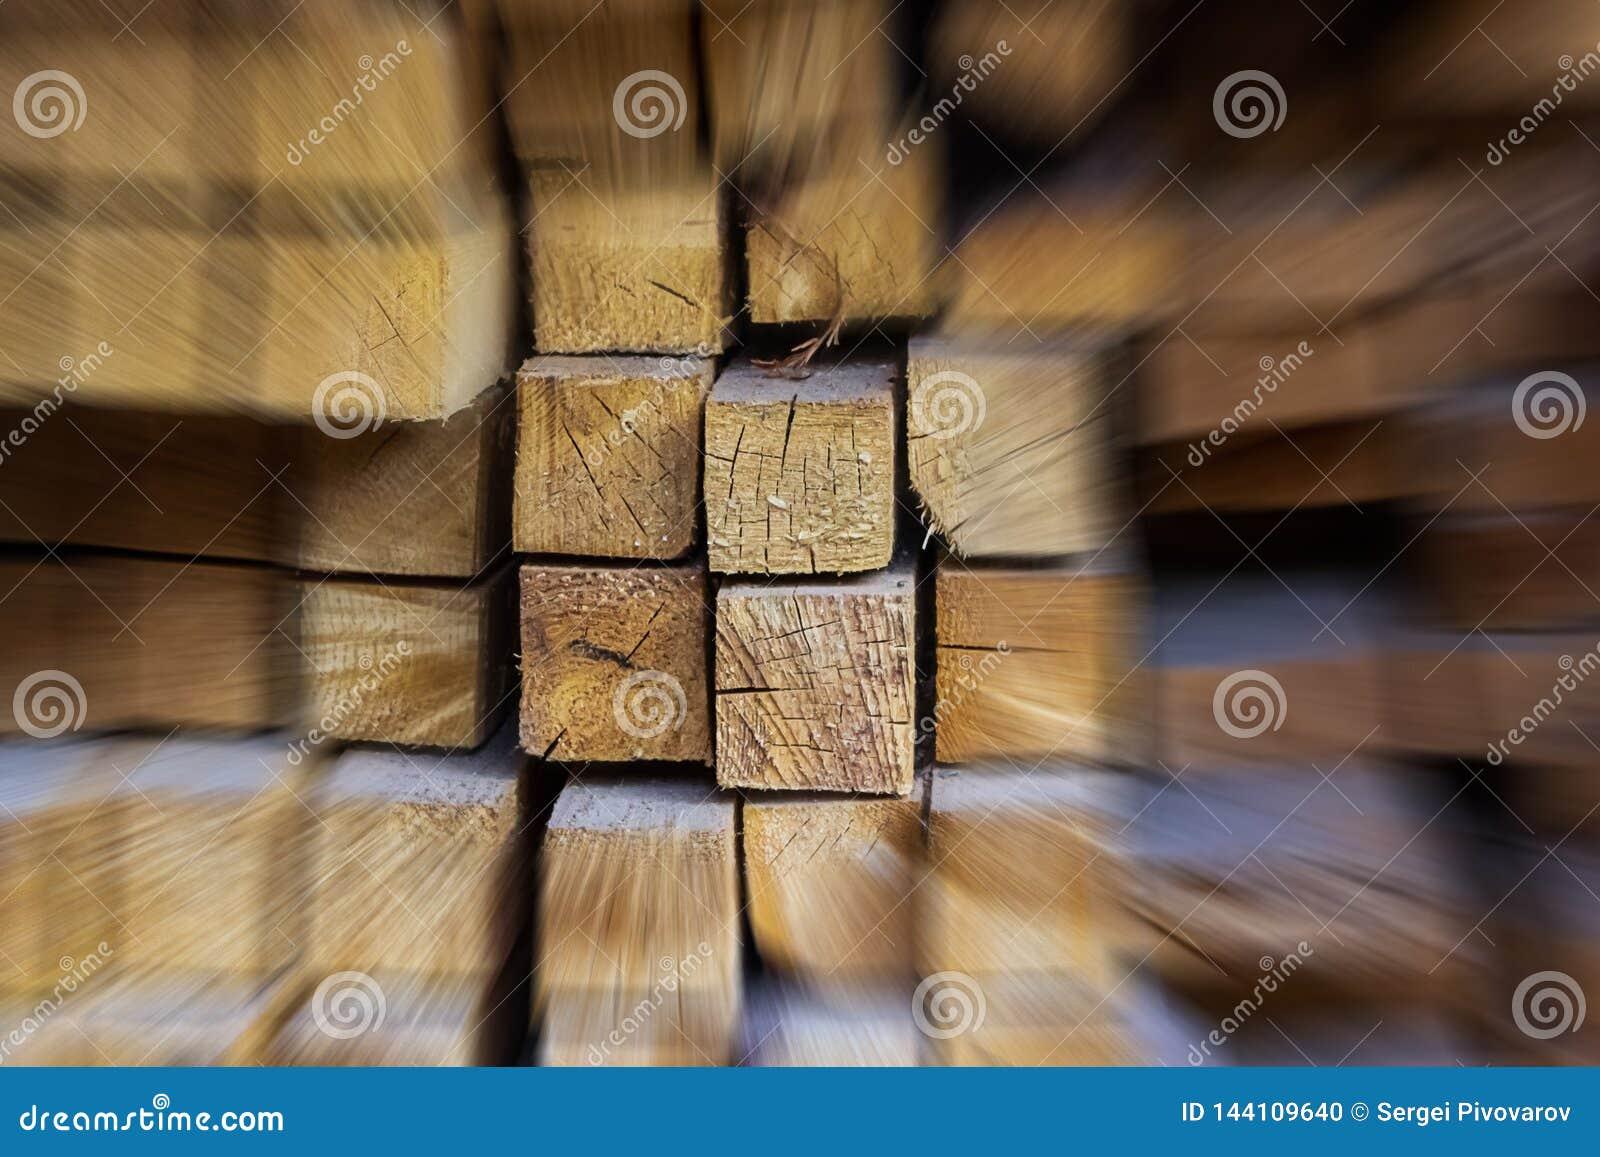 El grupo de madera abstracto del fondo de la aceleraci?n de haces entre los materiales de construcci?n borrosos destac? la base d